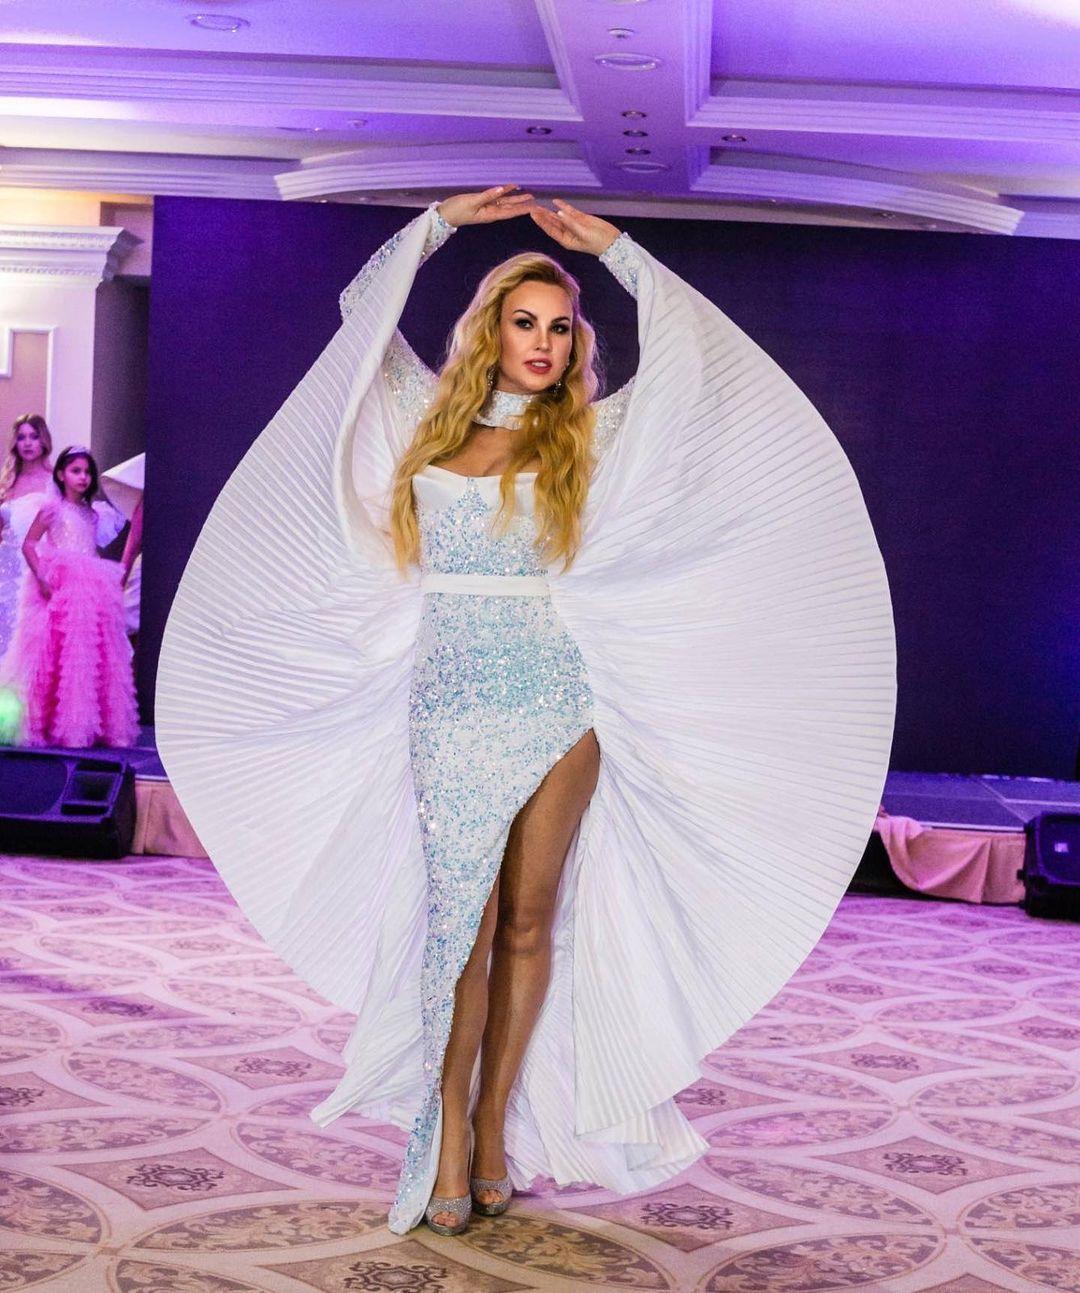 Камалія брала участь у конкурсах краси / instagram.com/kamaliyaofficial